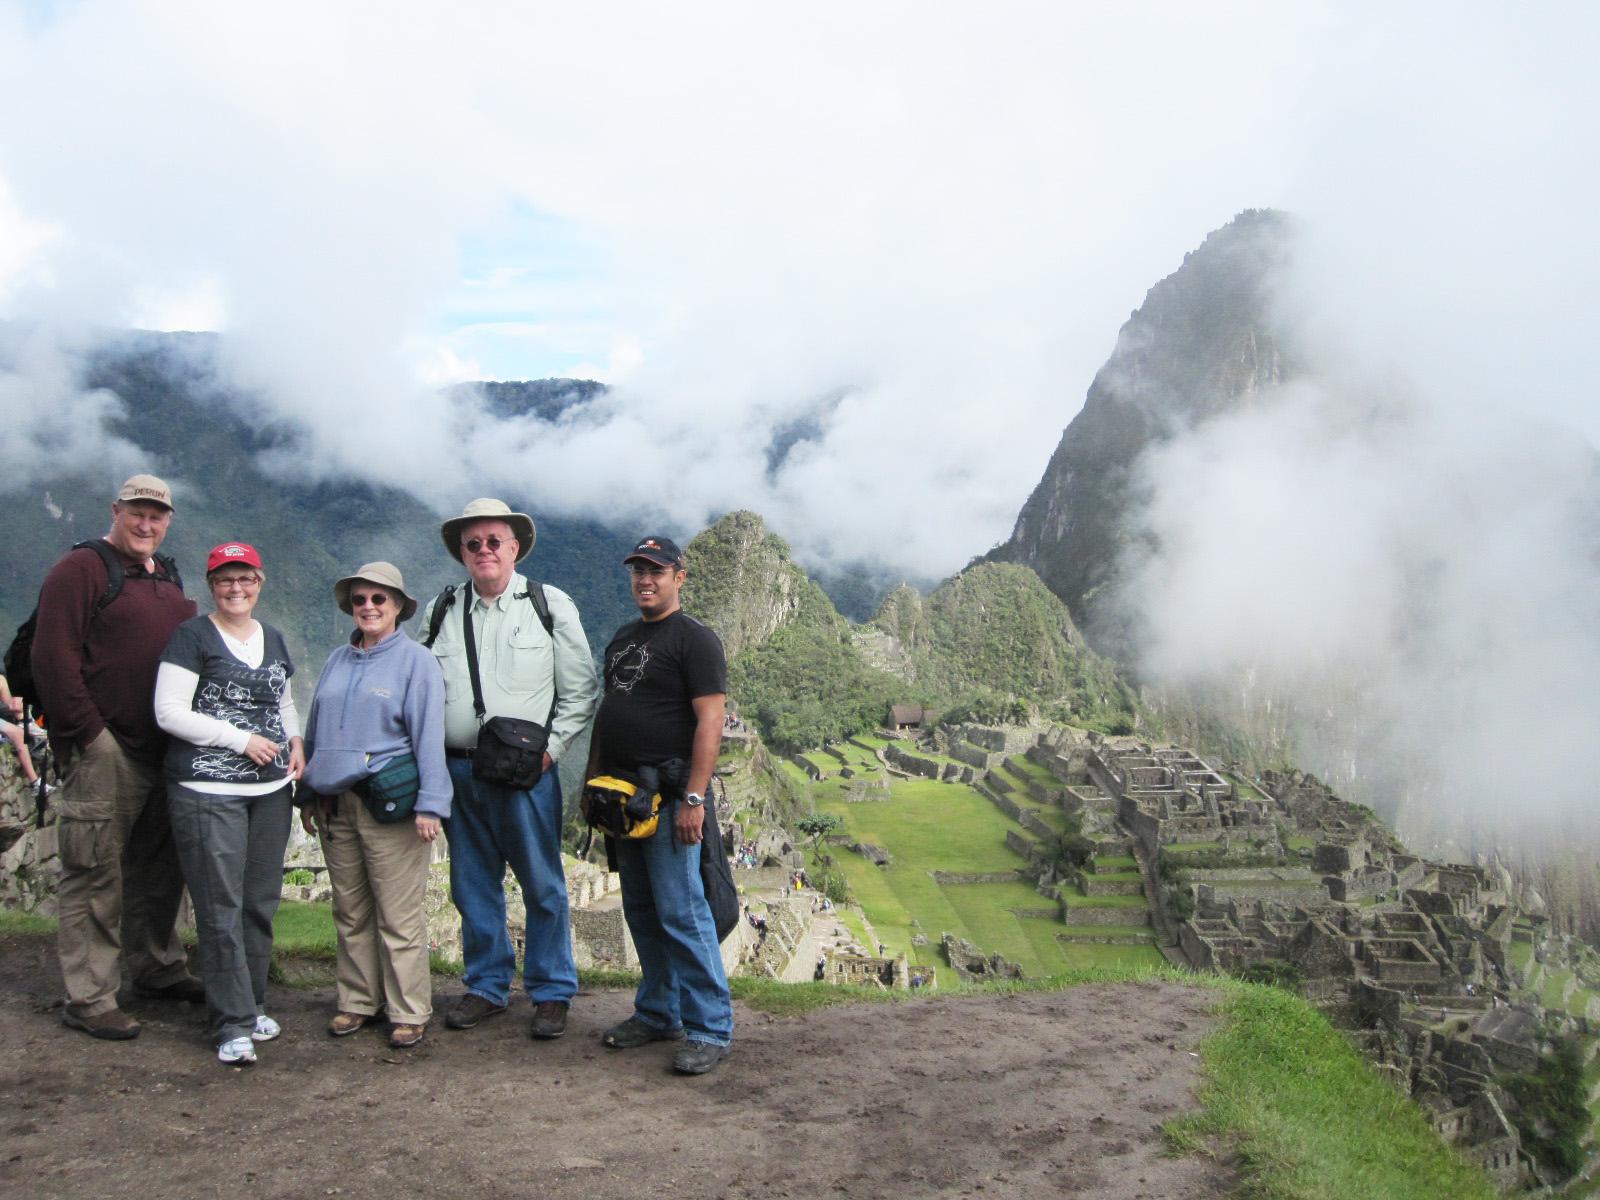 The Lima Peru LDS Temple Mission: 100th Anniversary of Hiram